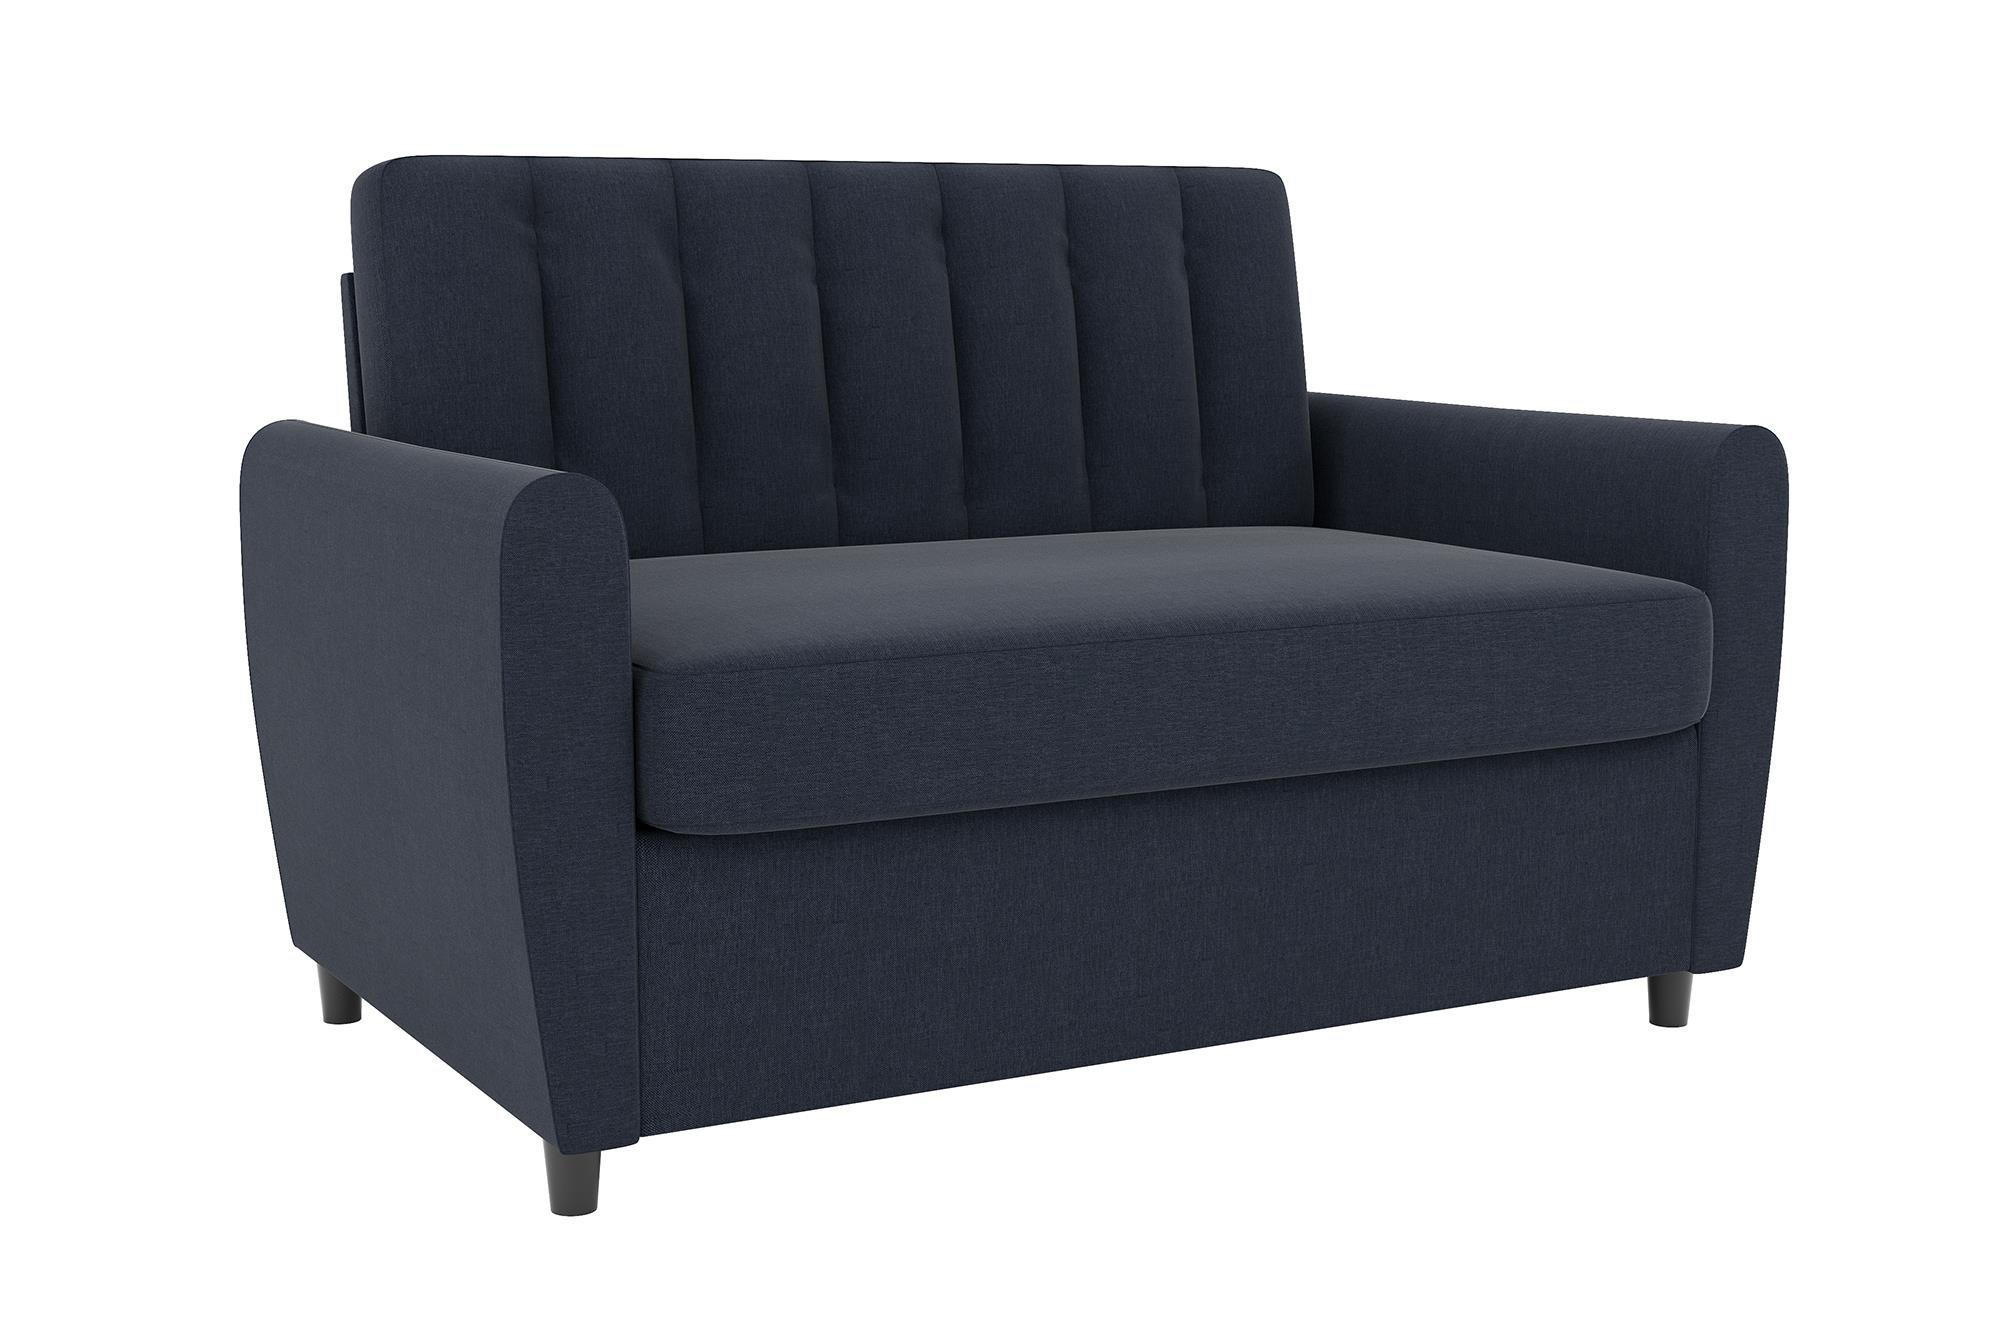 sleeper sofa twin amazon com rh amazon com twin size sofa chair twin sleeper sofa chair target